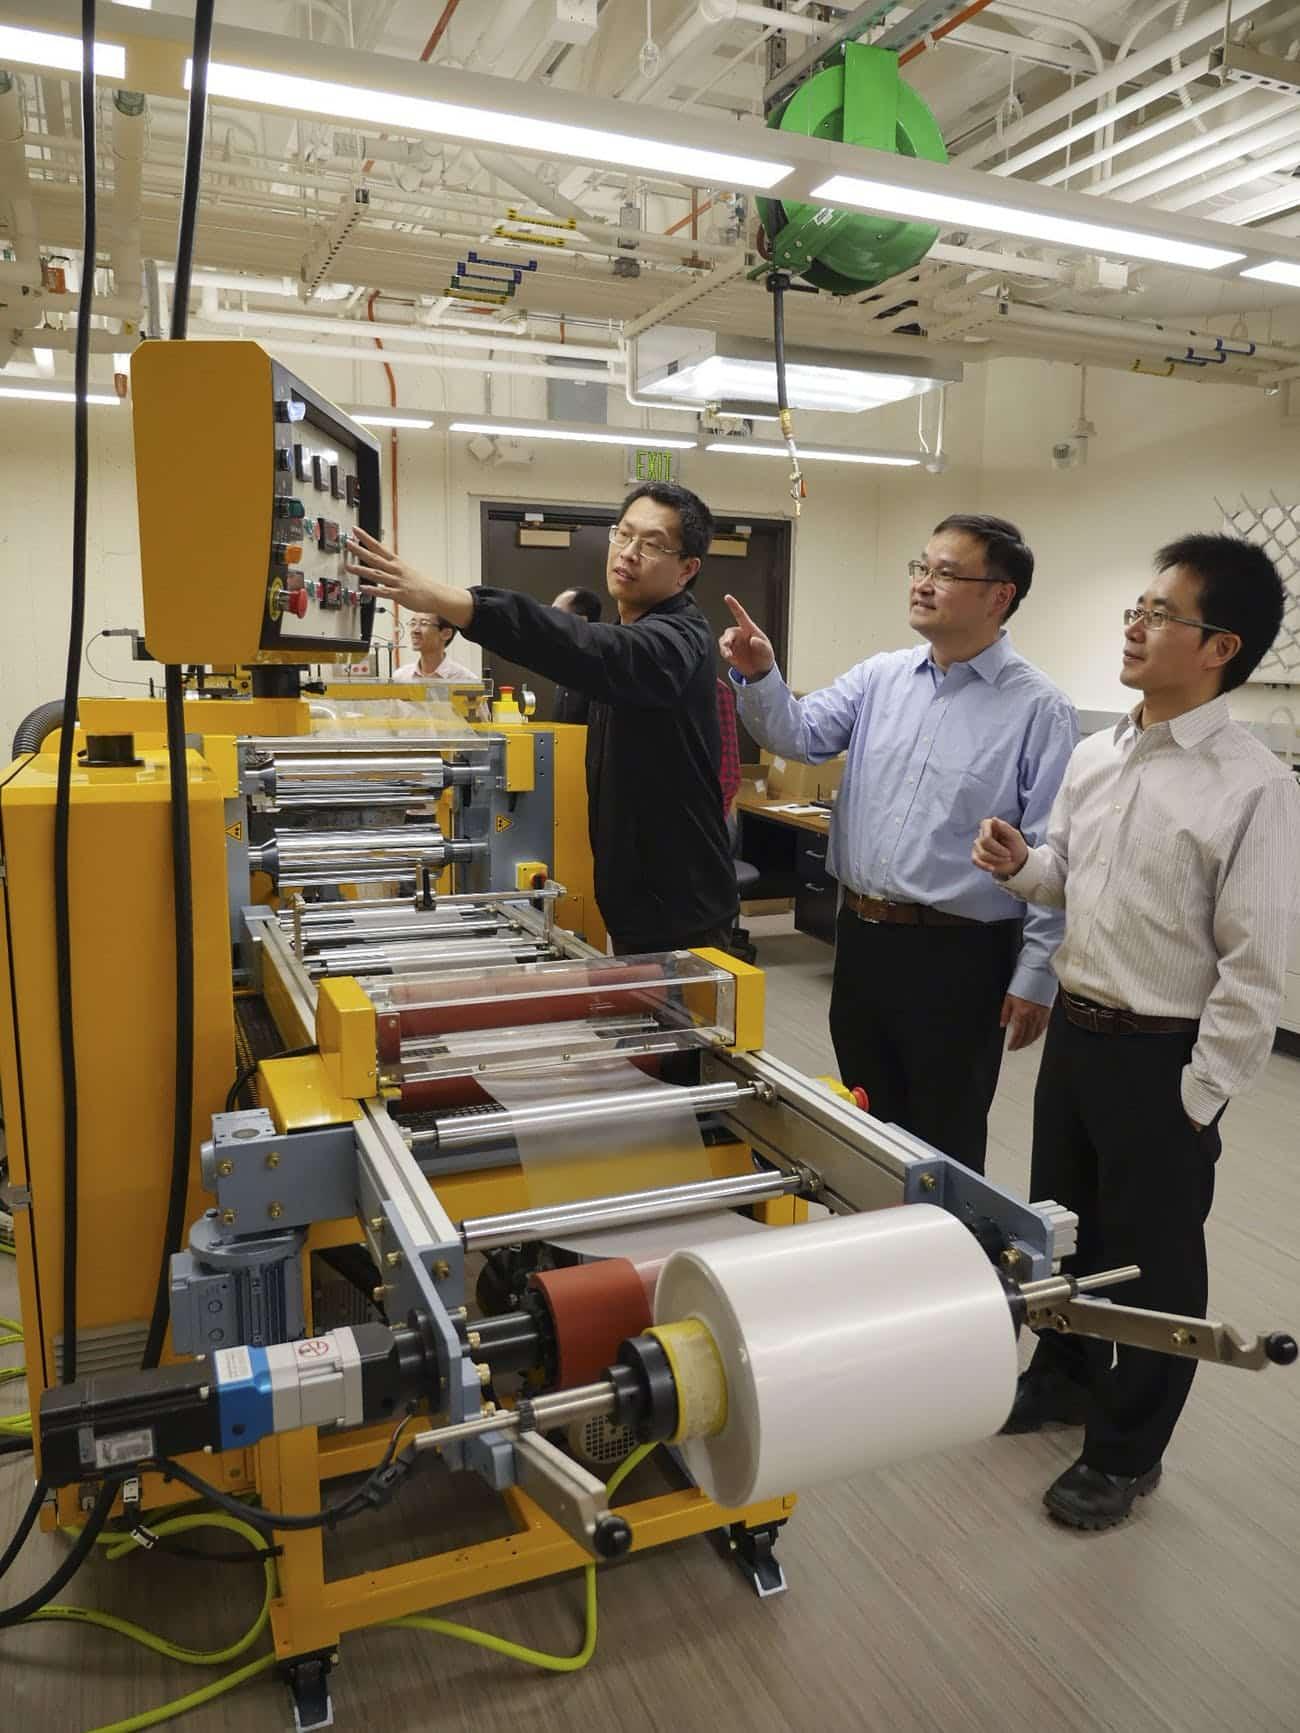 substituto ar condicionado a arquiteta 3 - Material promete substituir o ar-condicionado